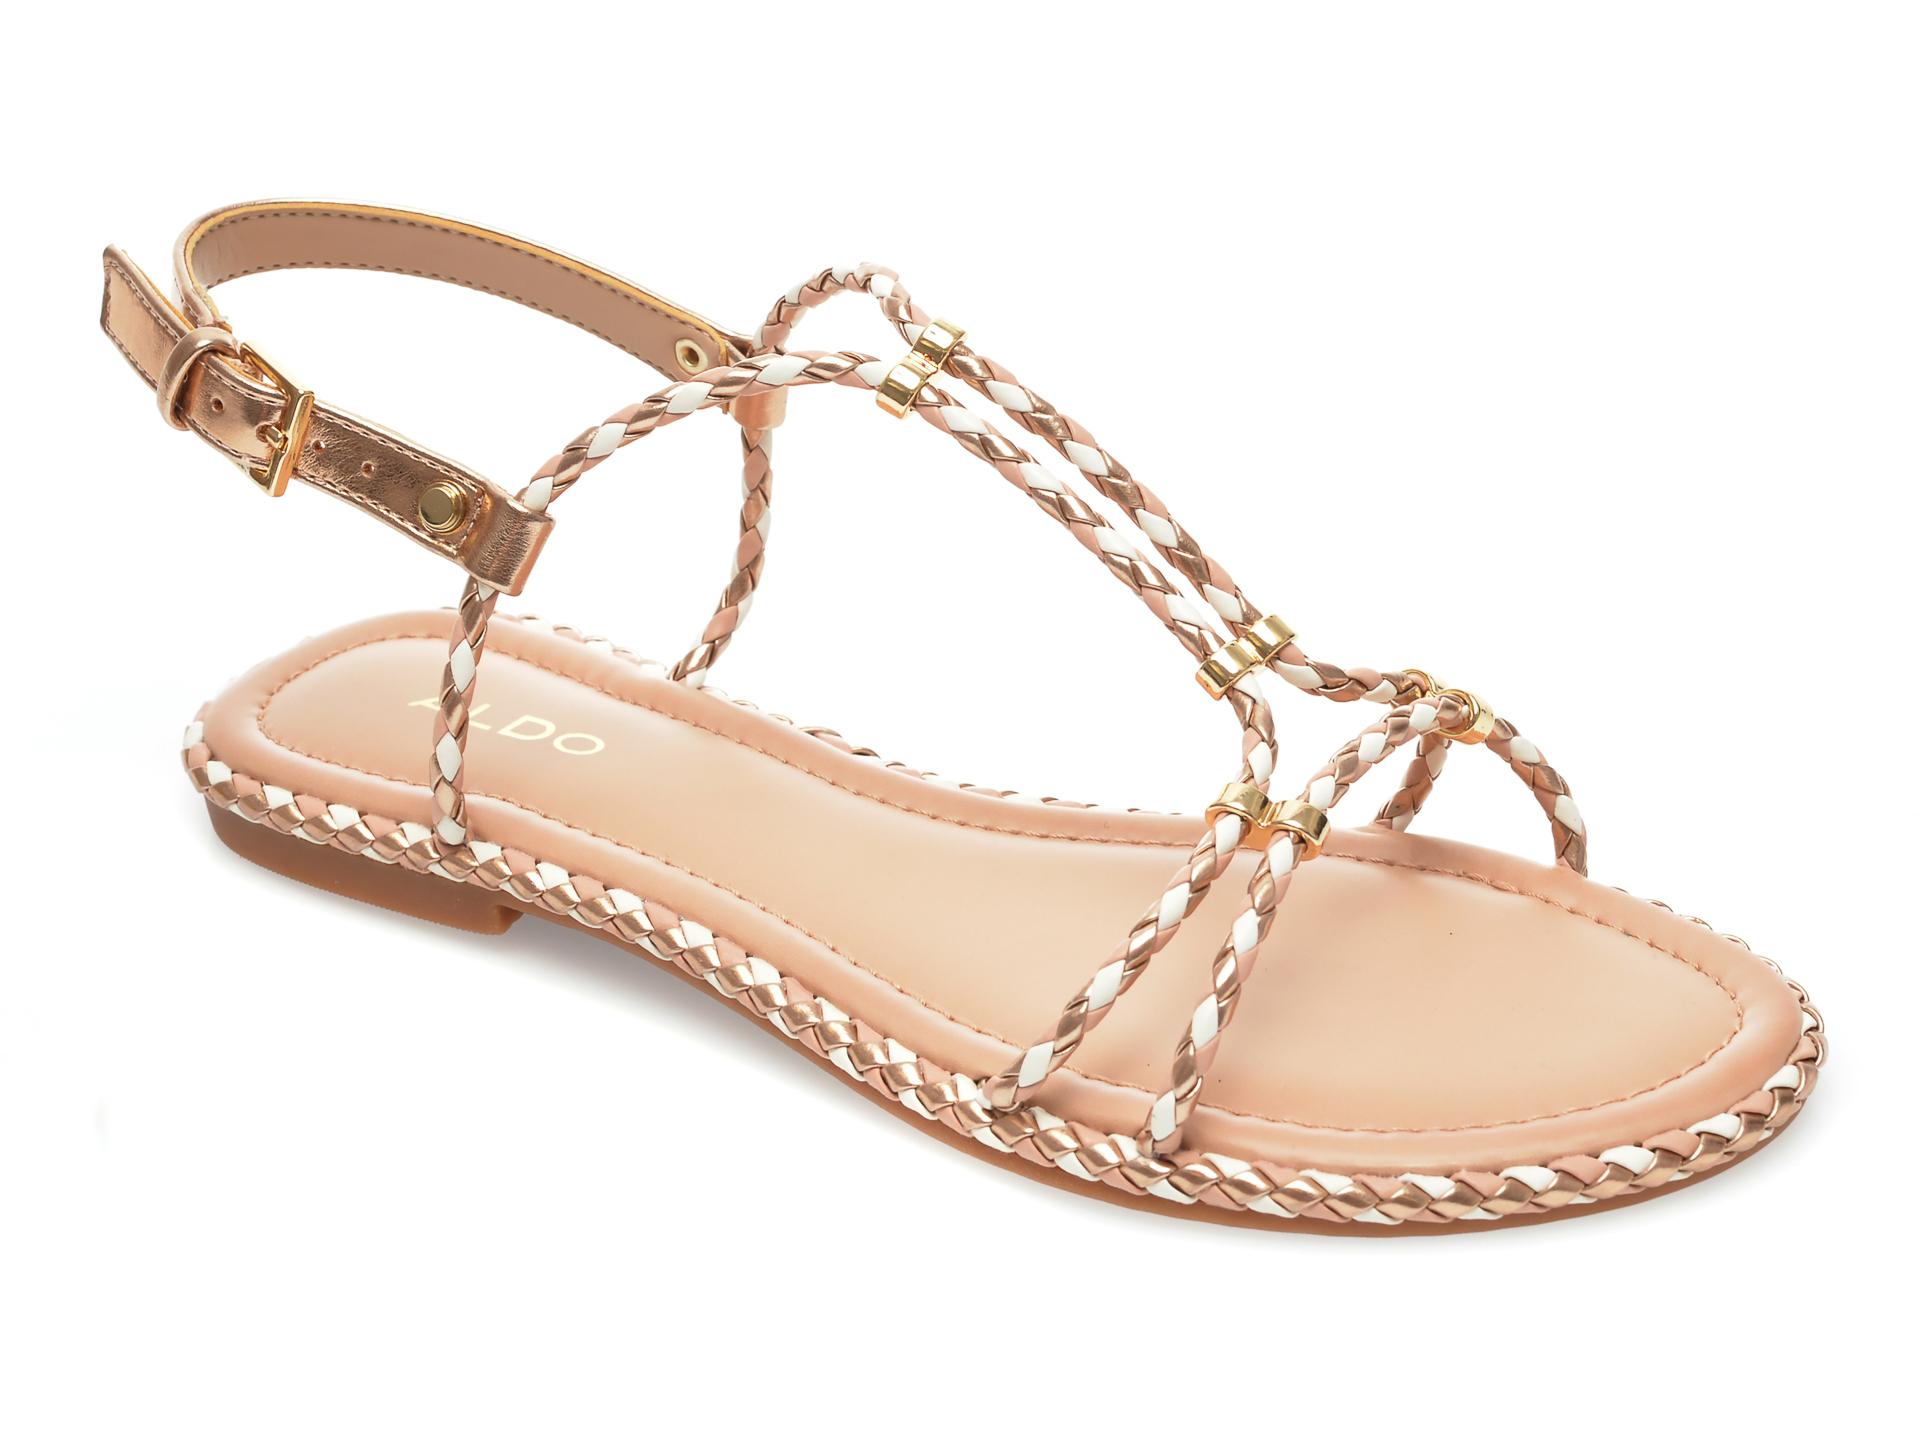 Sandale ALDO aurii, Qilinna653, din piele ecologica imagine otter.ro 2021